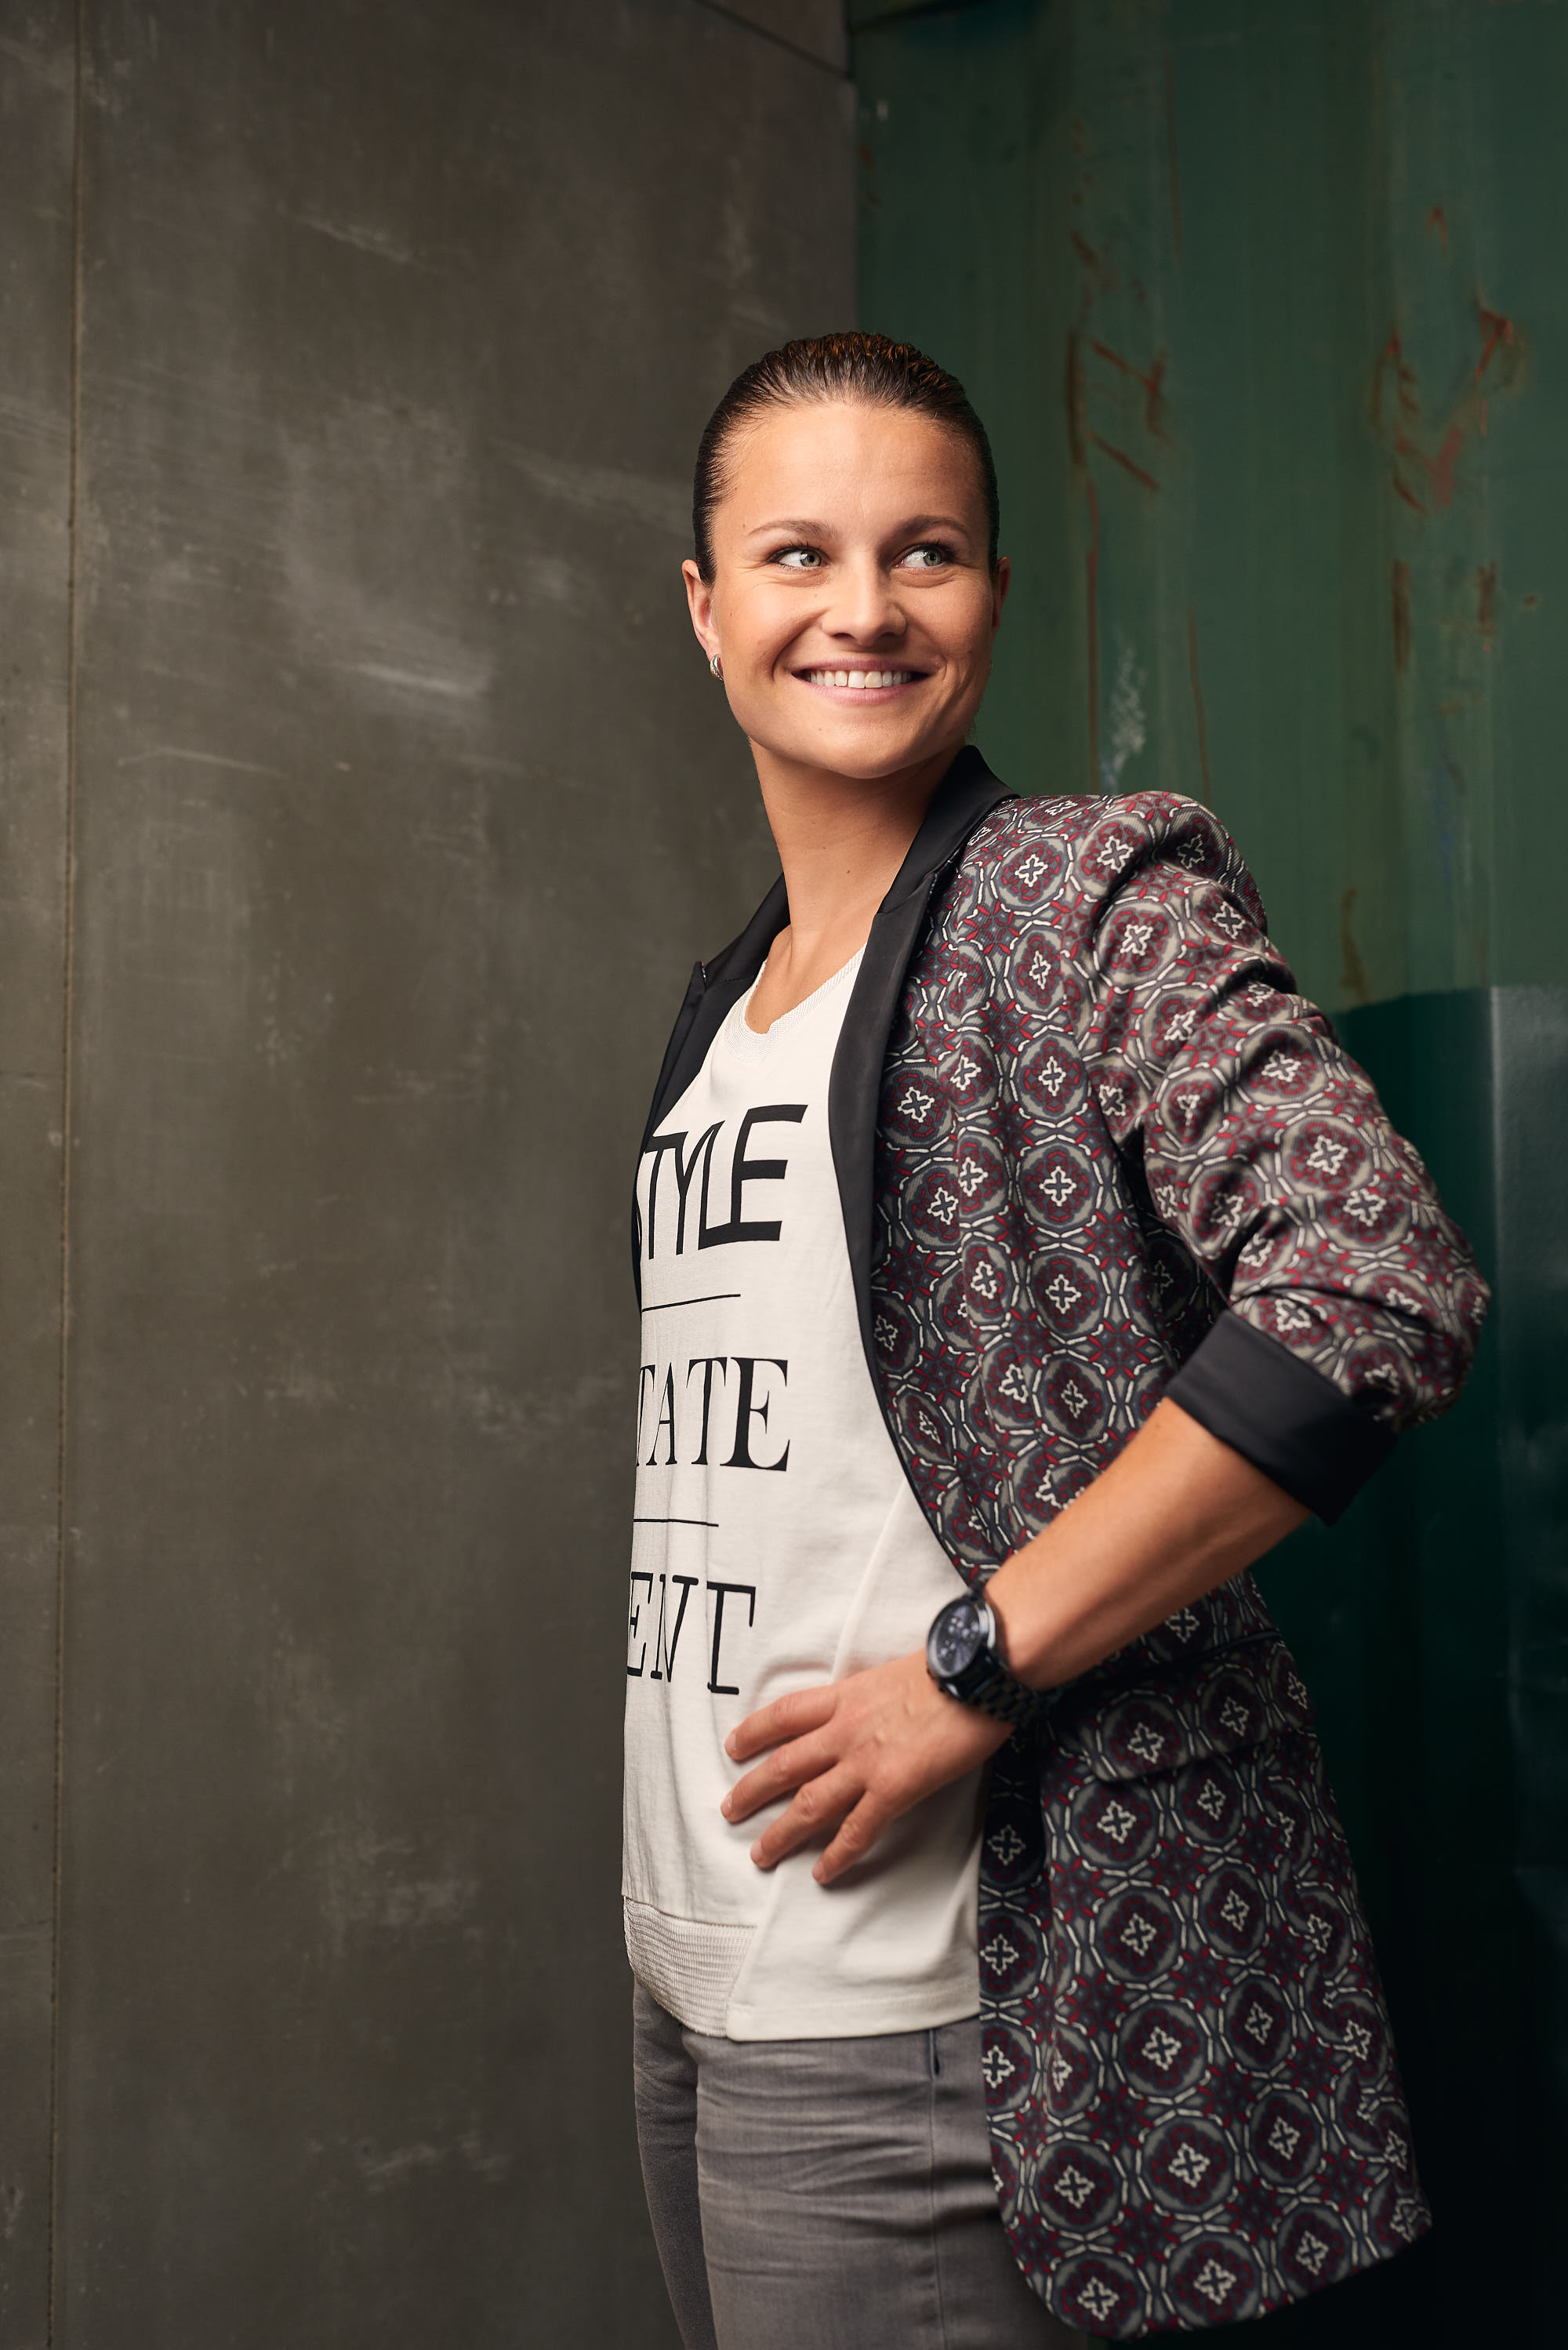 Dutch football star Sherida Spitse for Expresso fashion